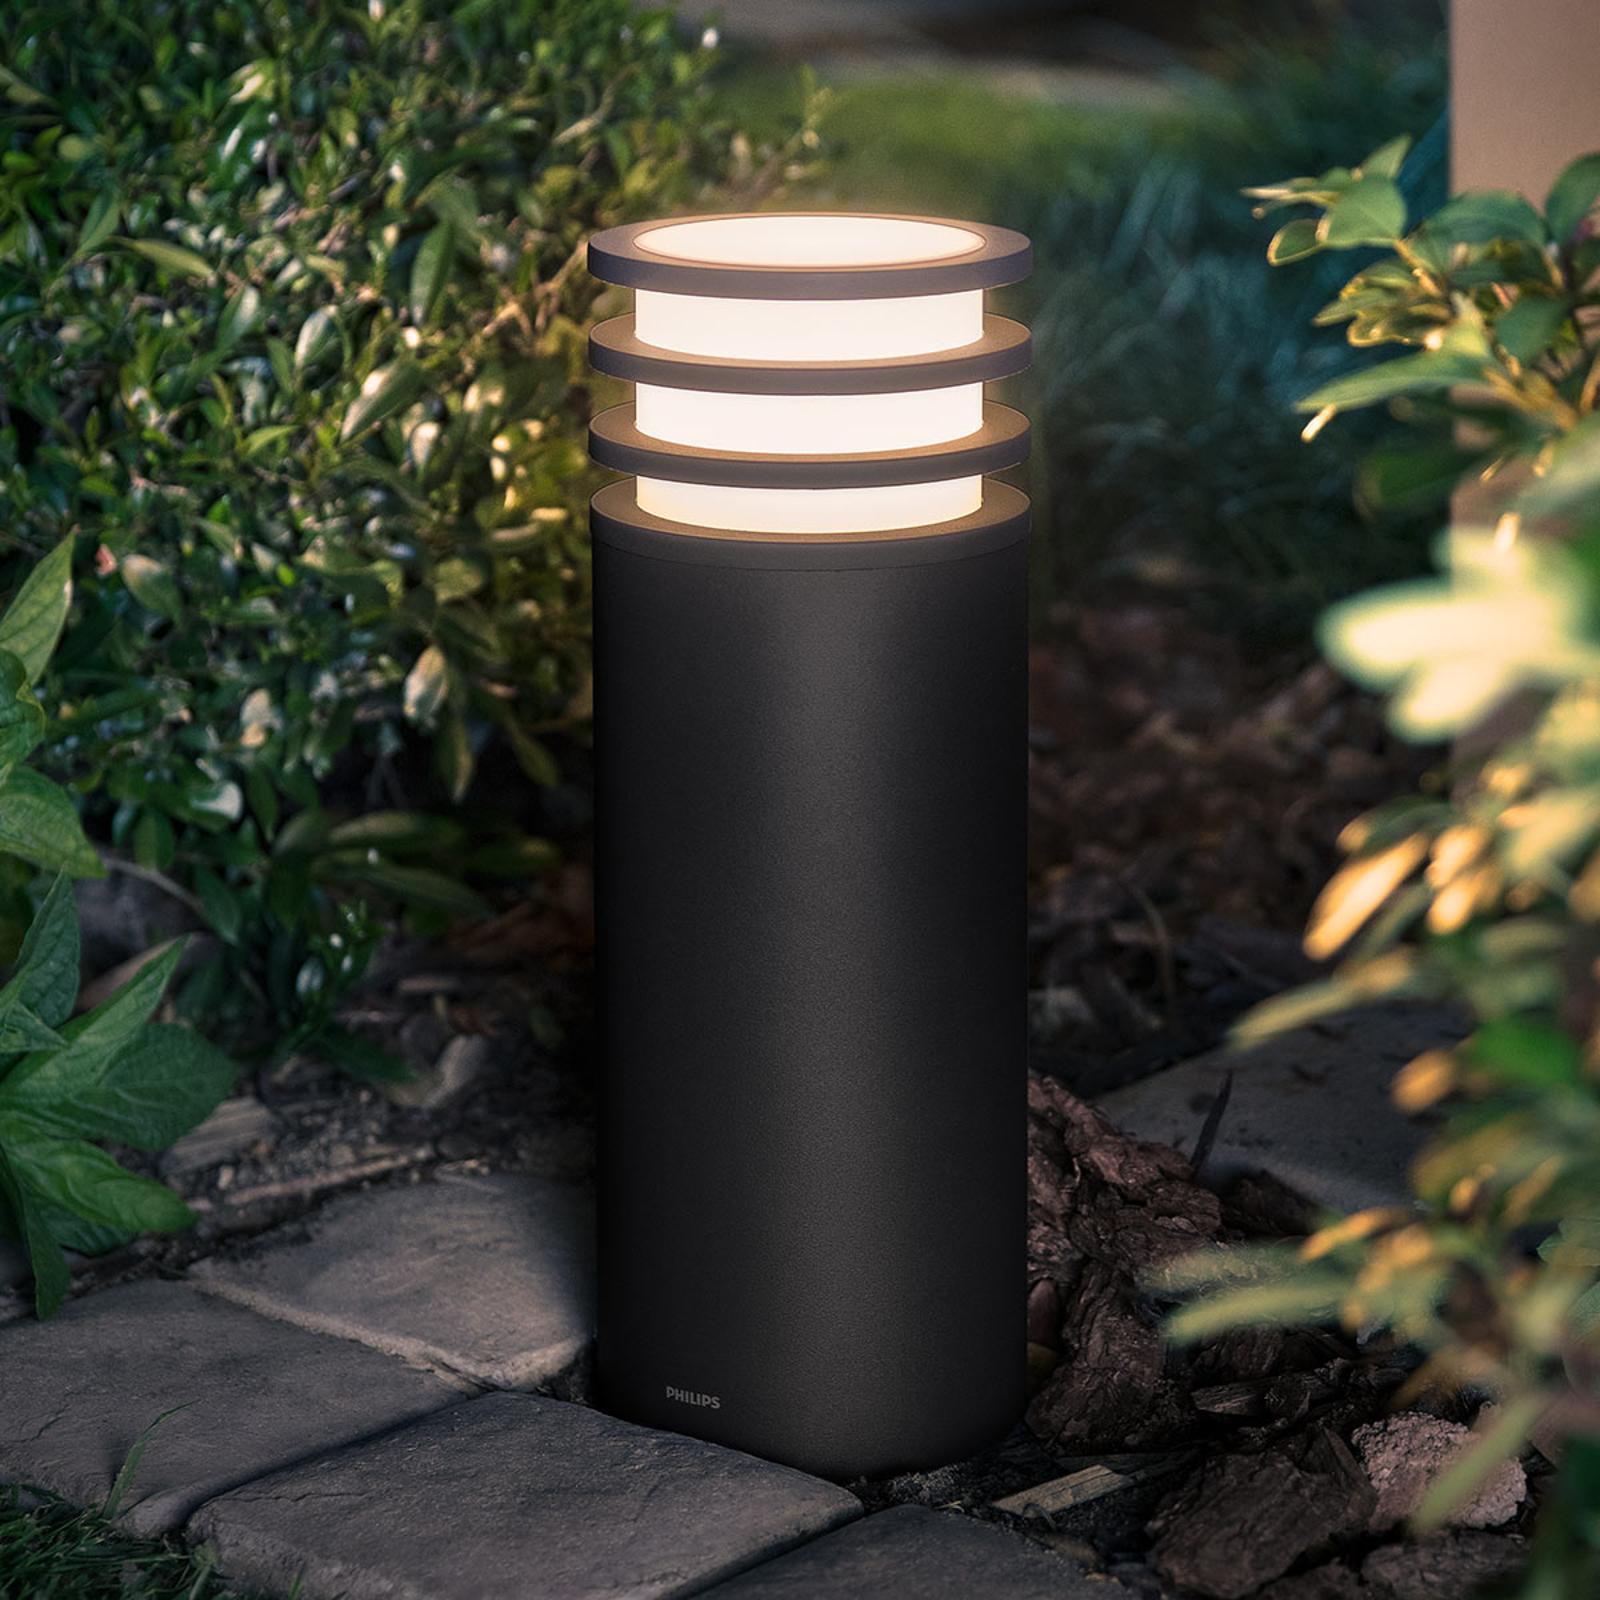 Philips Hue LED-marklykta Lucca, via app styrbar